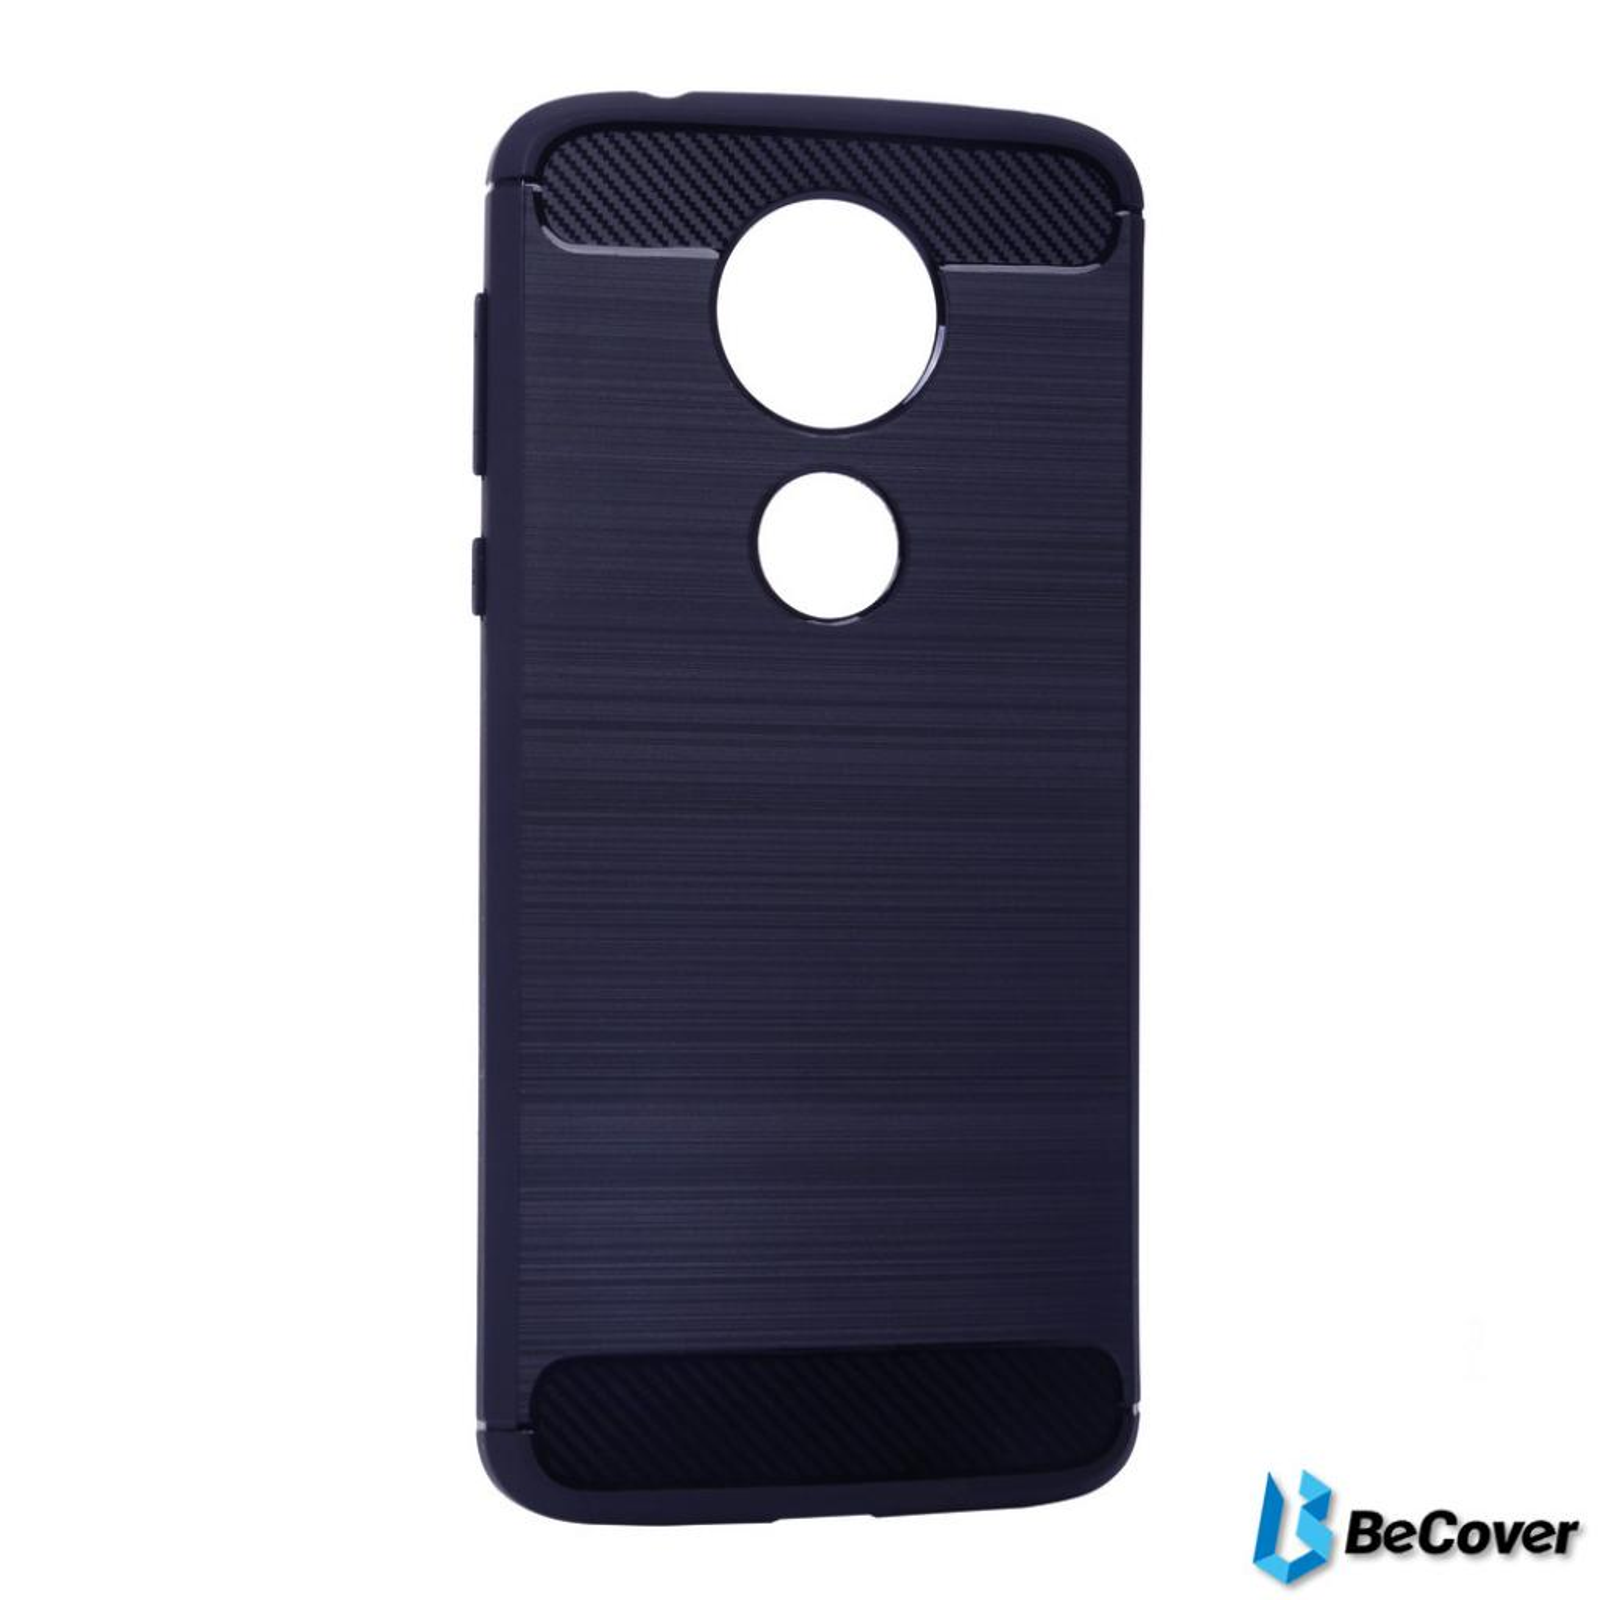 Чехол для моб. телефона BeCover Motorola Moto E5 Plus Blue (XT1924-1) Black (702780)